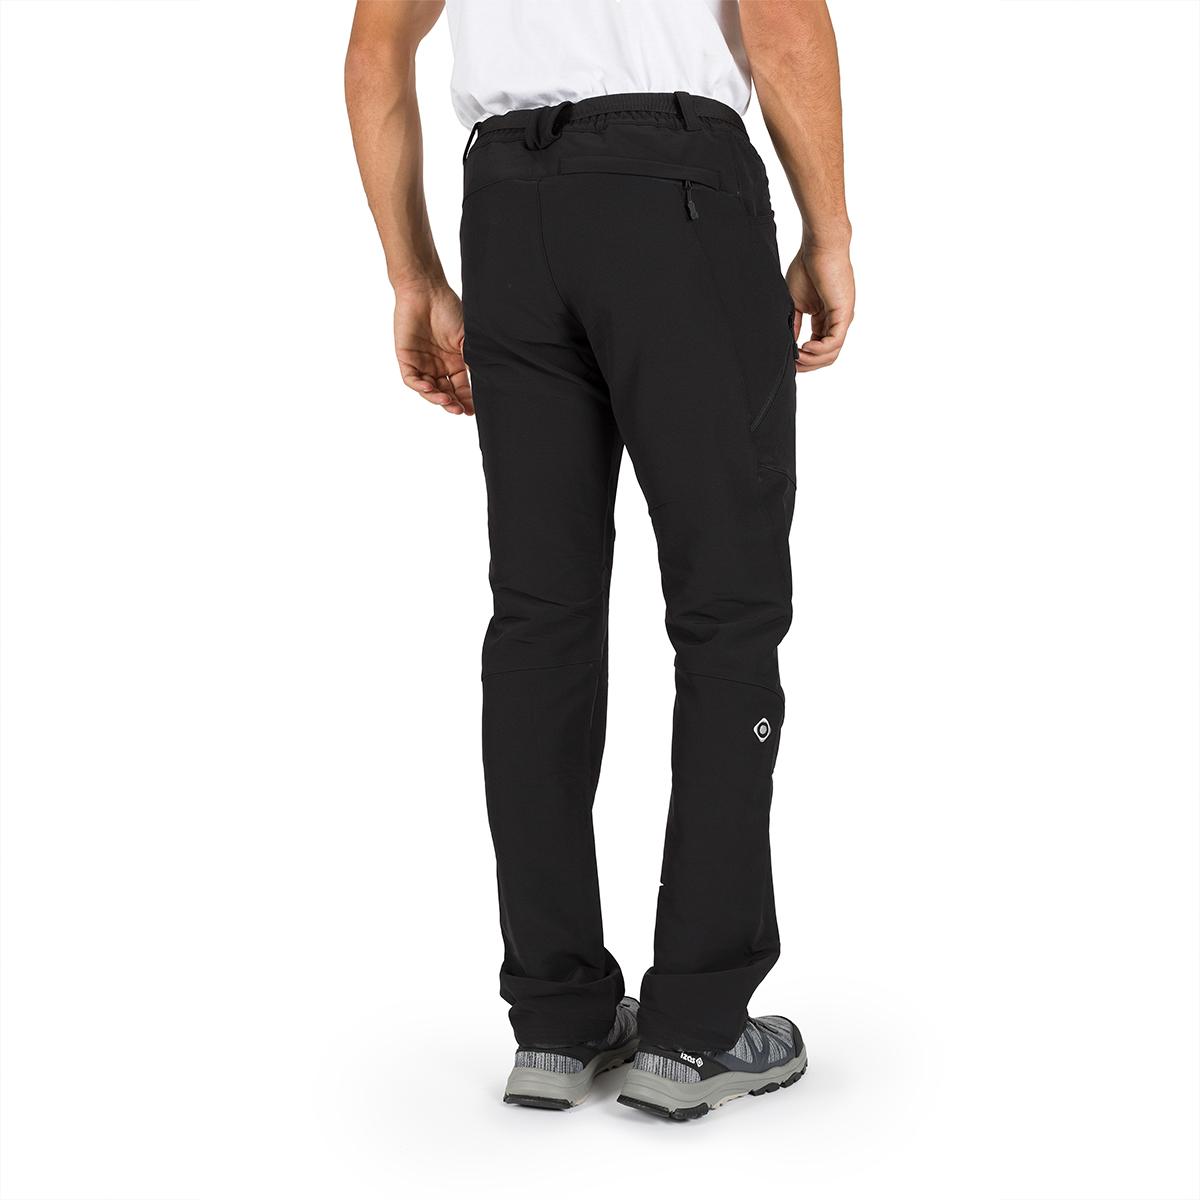 MAN'S CAPRI STRETCH PANT BLACK